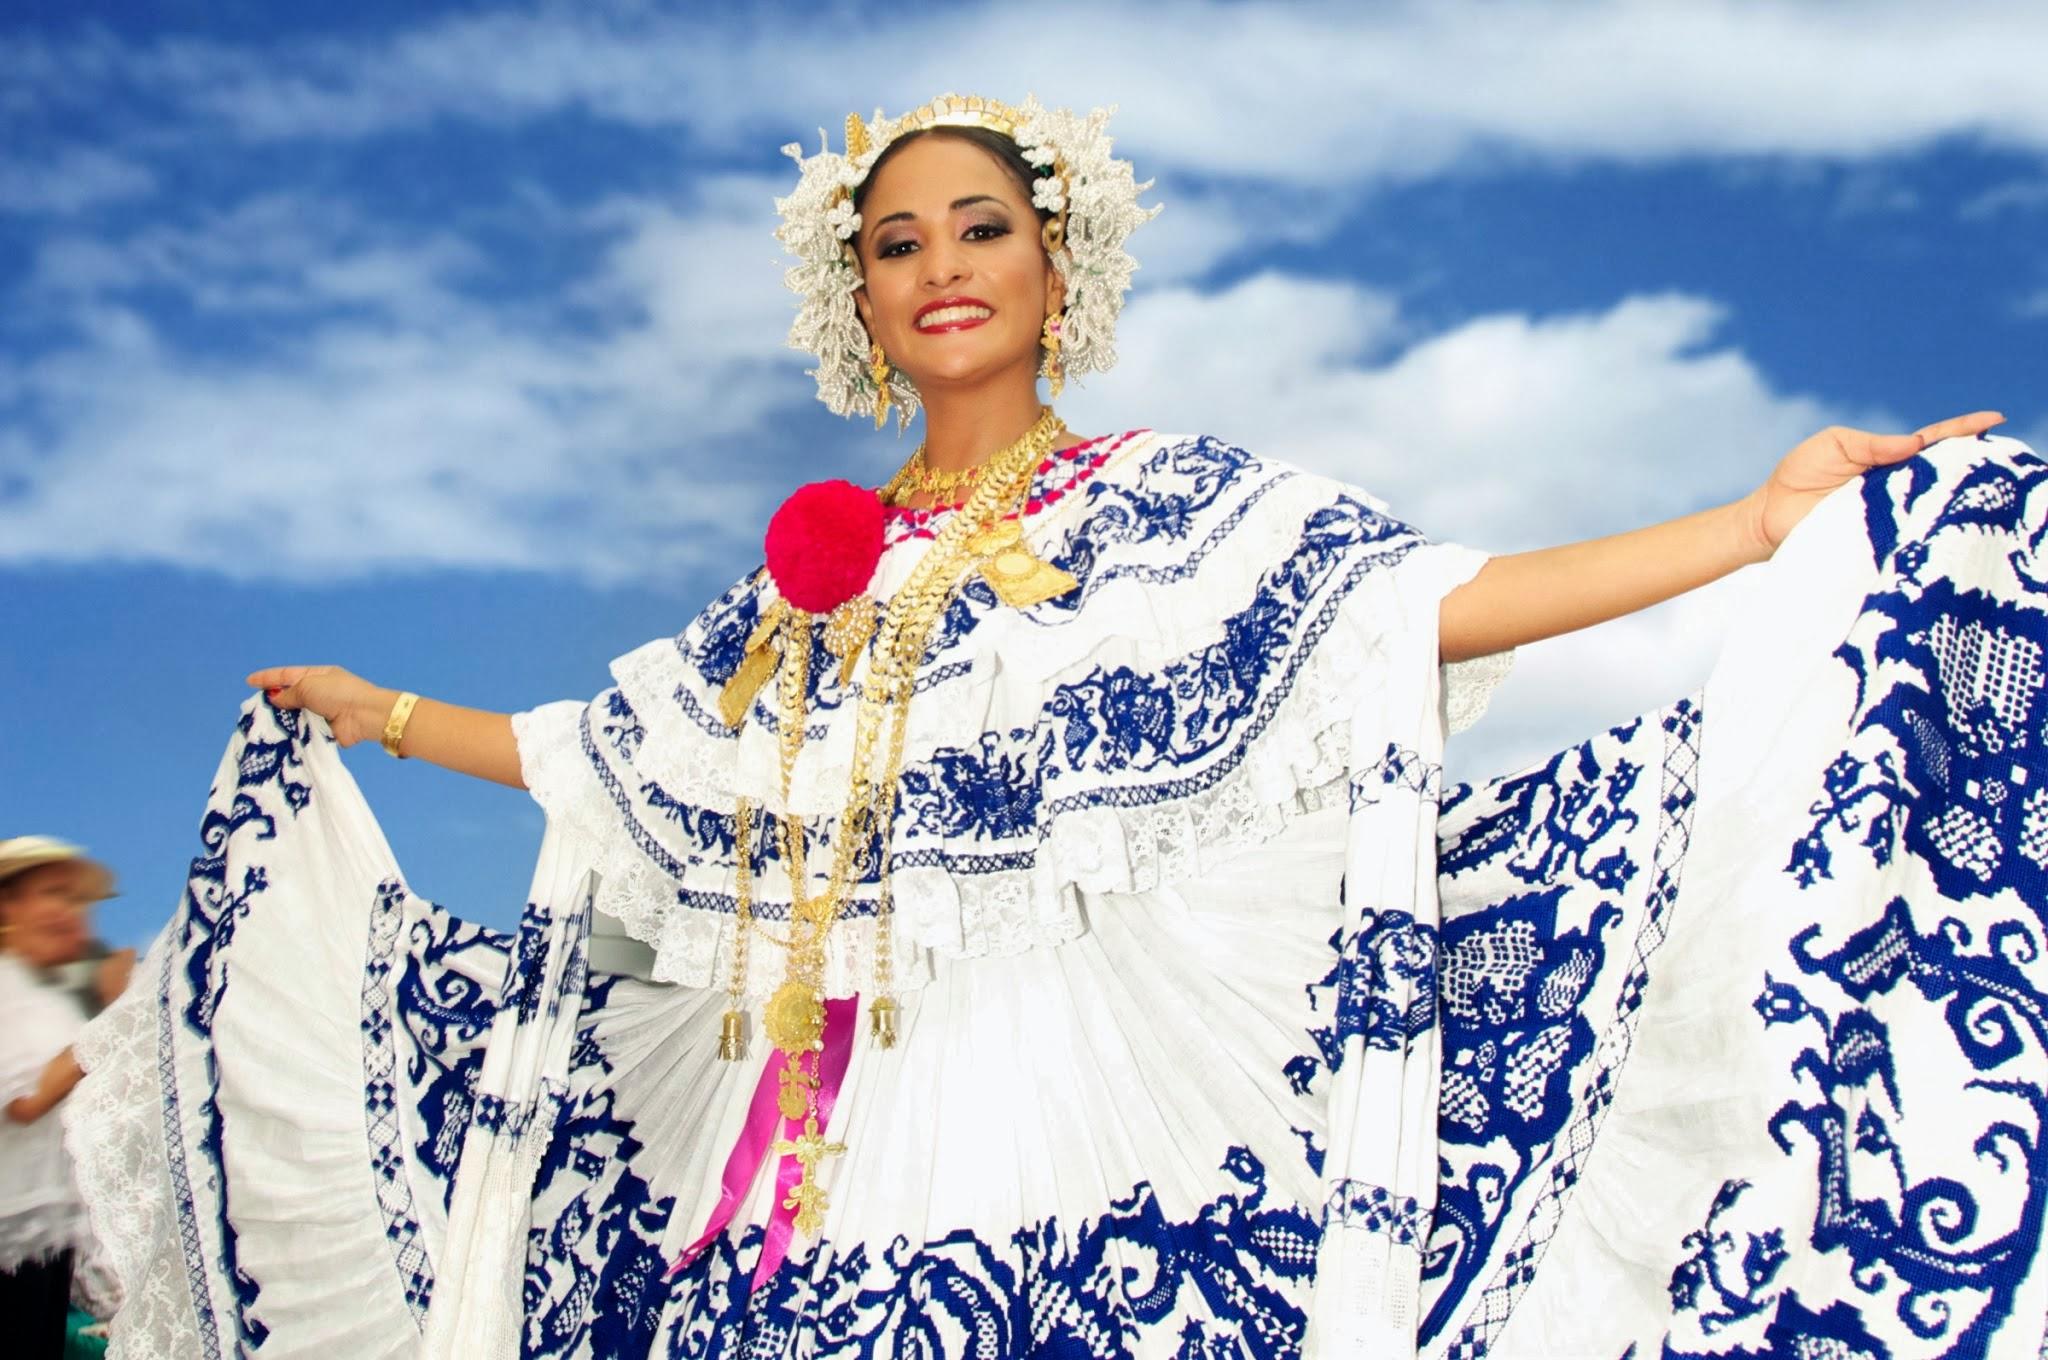 Panama culture and folklore - Photo credit to Visitpanama.com